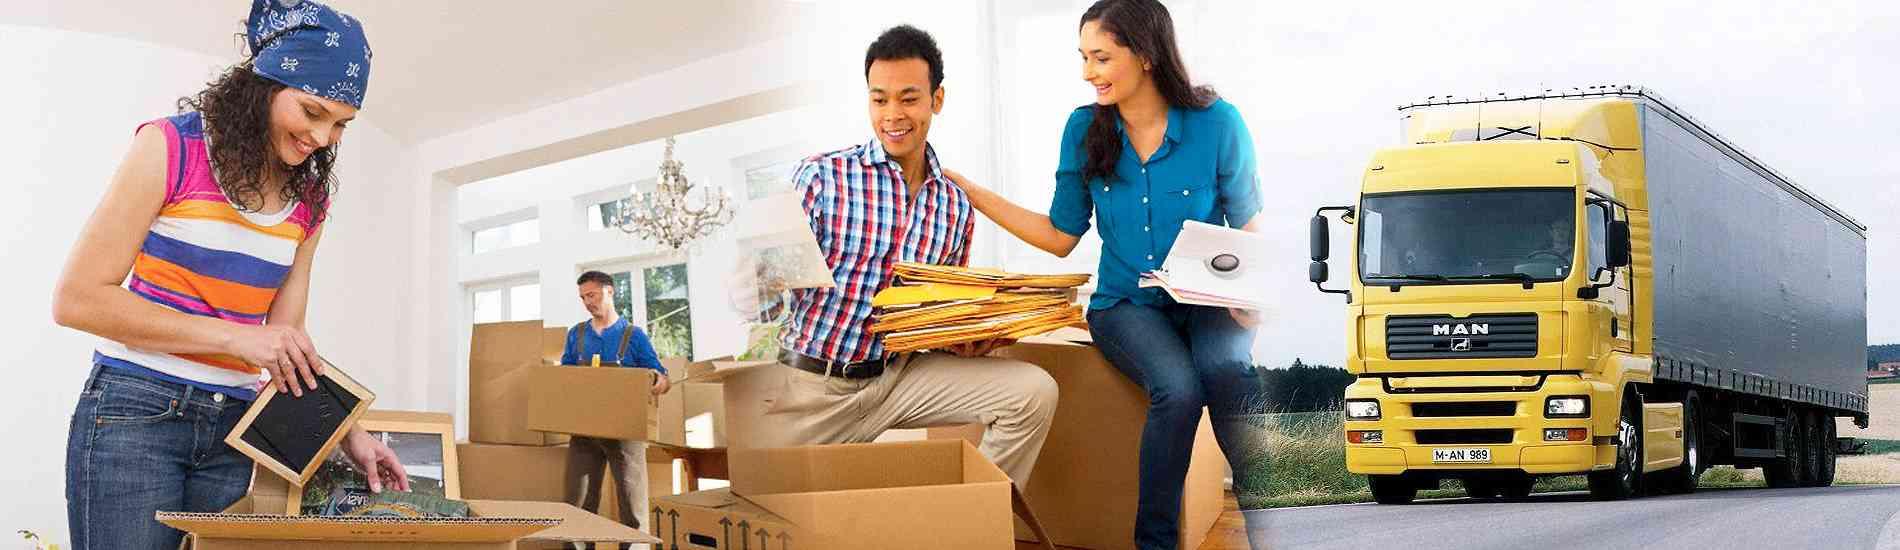 packers and movers vadodara